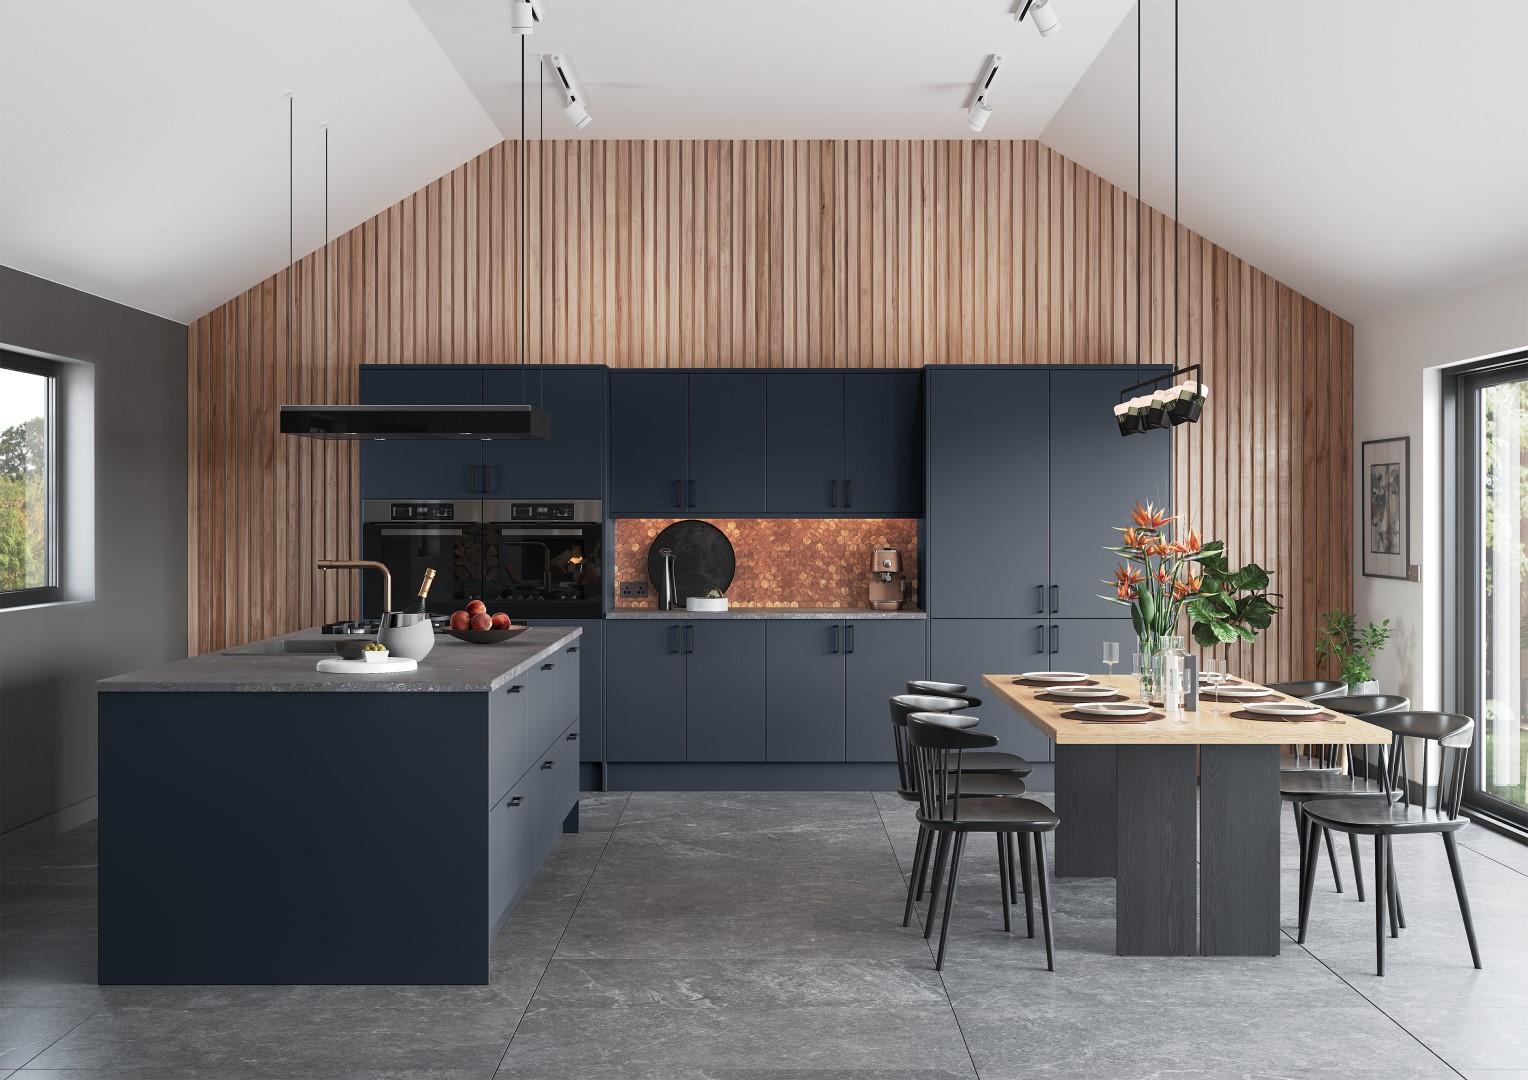 Zola Matte Slate Blue Handleless Kitchen - Kitchen Design - Alan Kelly Kitchens - Waterford